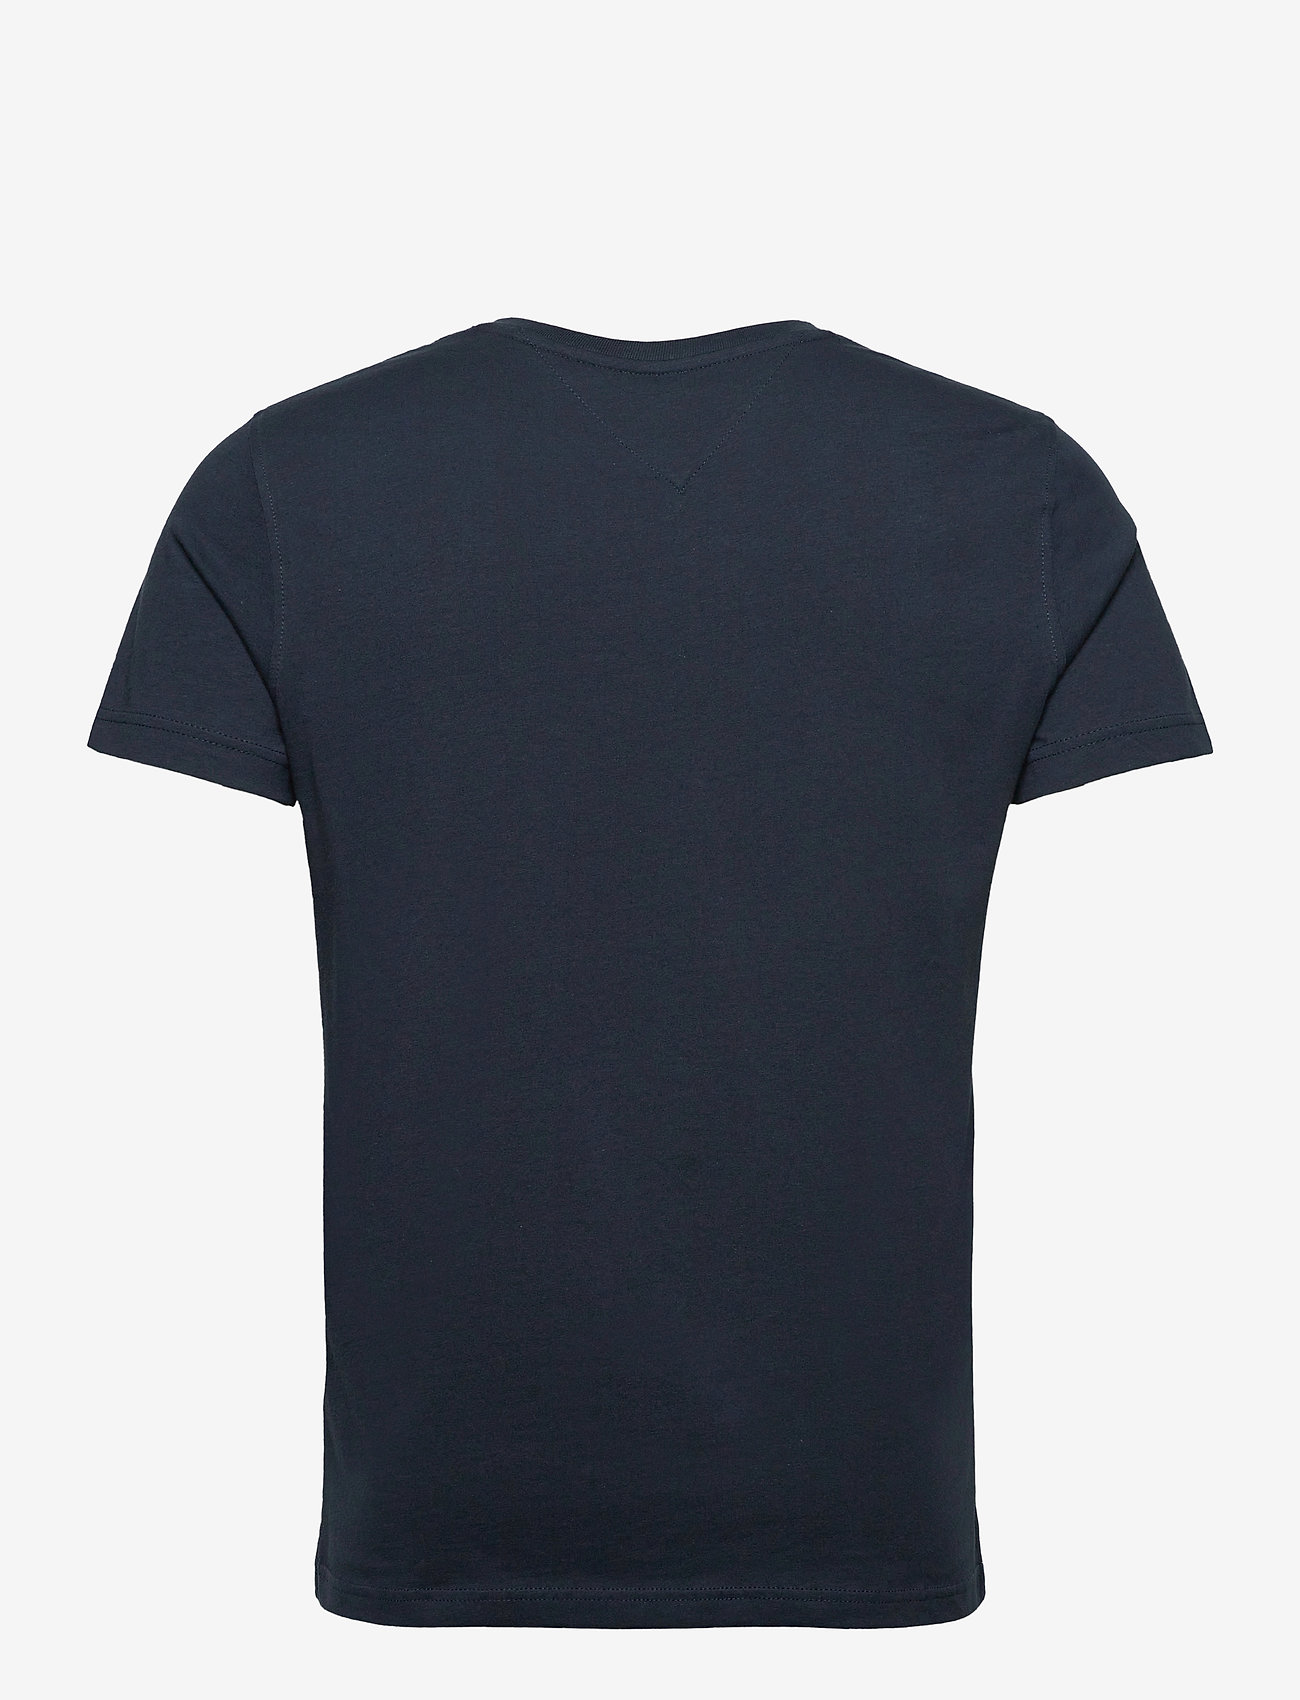 Tommy Jeans - TJM ORIGINAL JERSEY V NECK TEE - basic t-shirts - black iris - 1